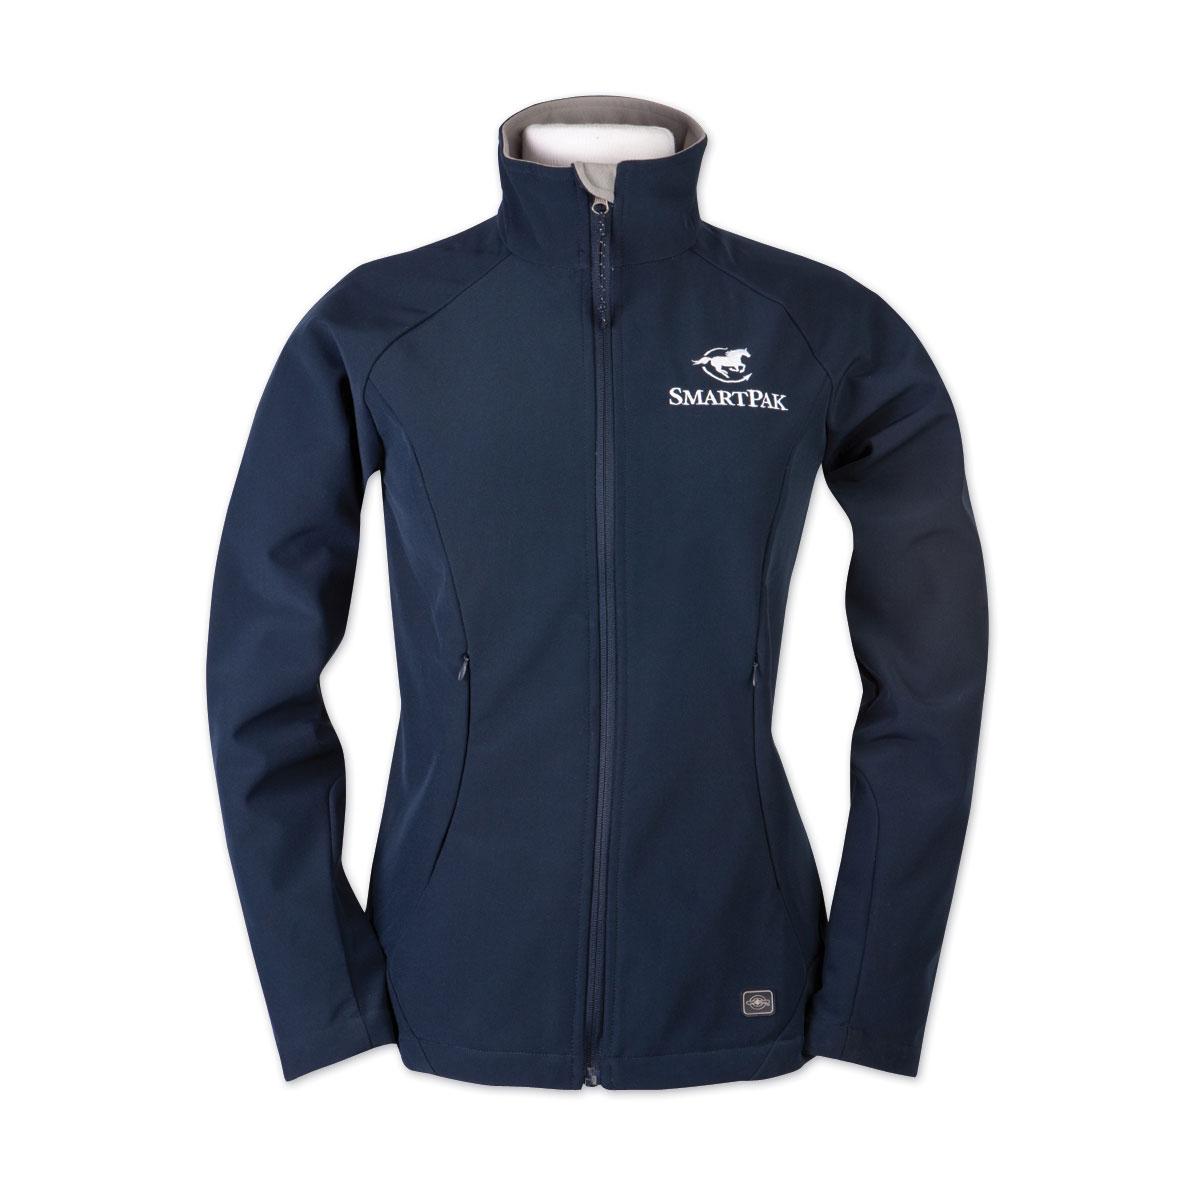 SmartPak Soft Shell Jacket